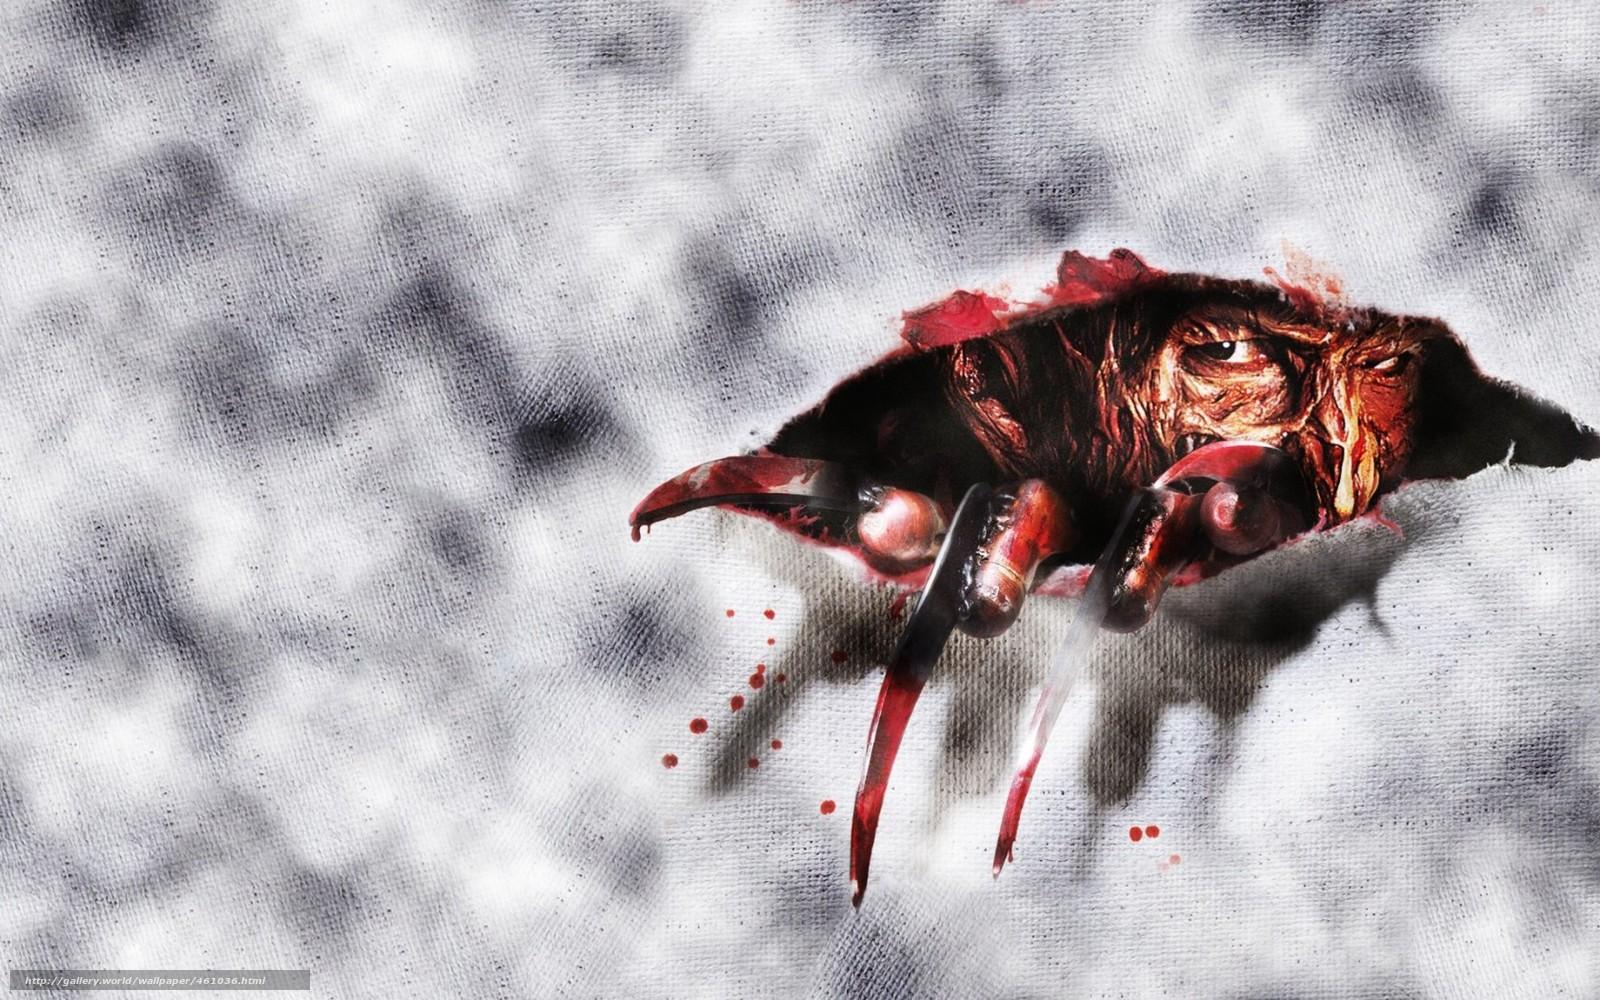 Download wallpaper Freddy Krueger Nightmare on Elm Street Horror 1600x1000